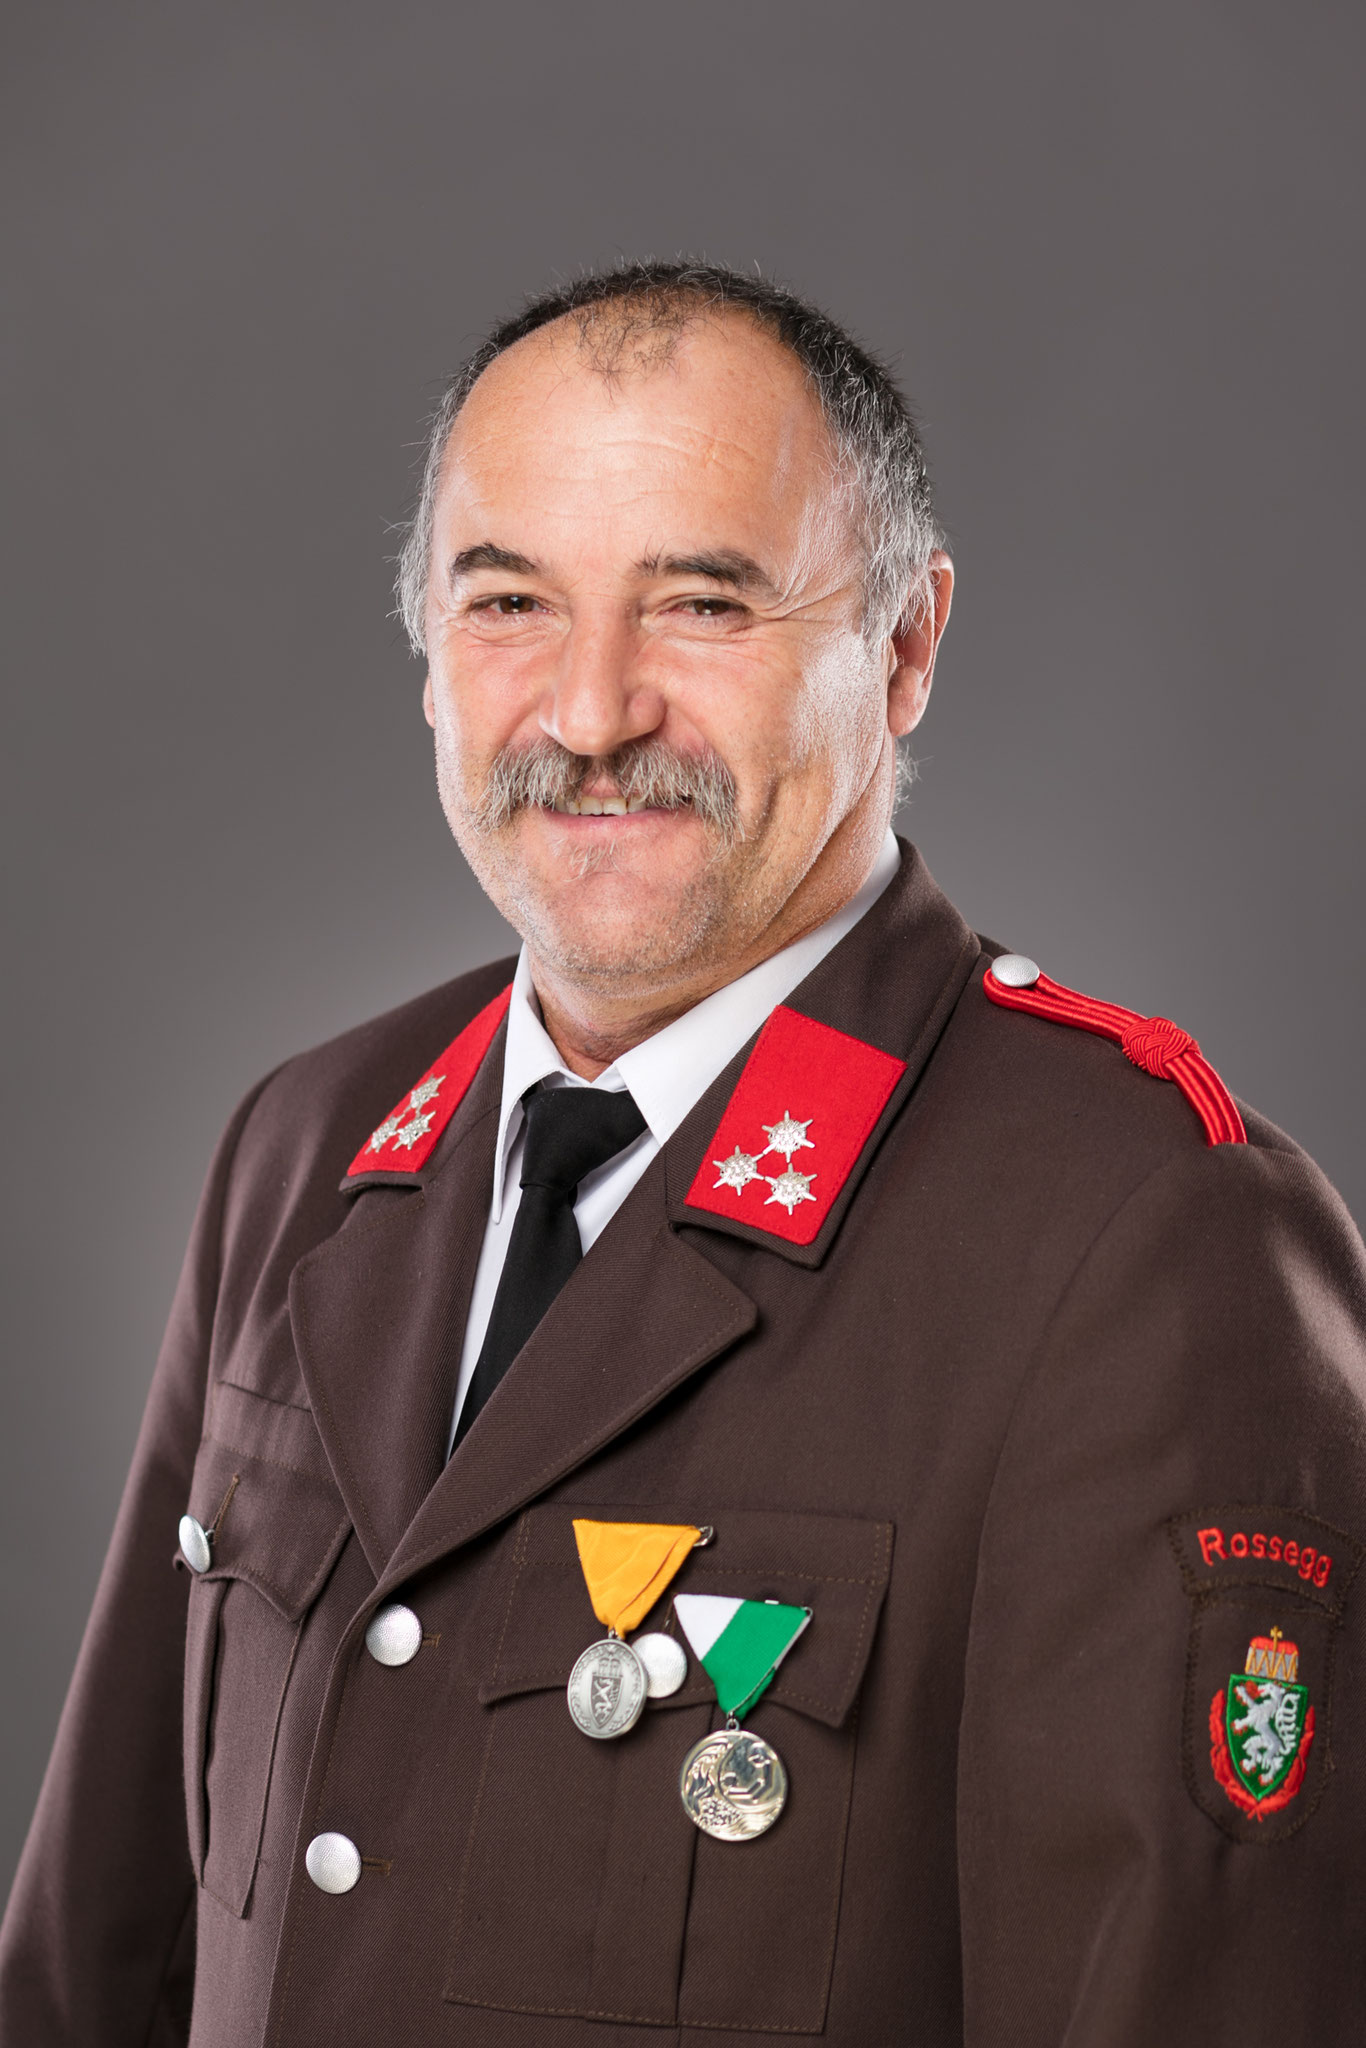 HFM NINAUS Ernst